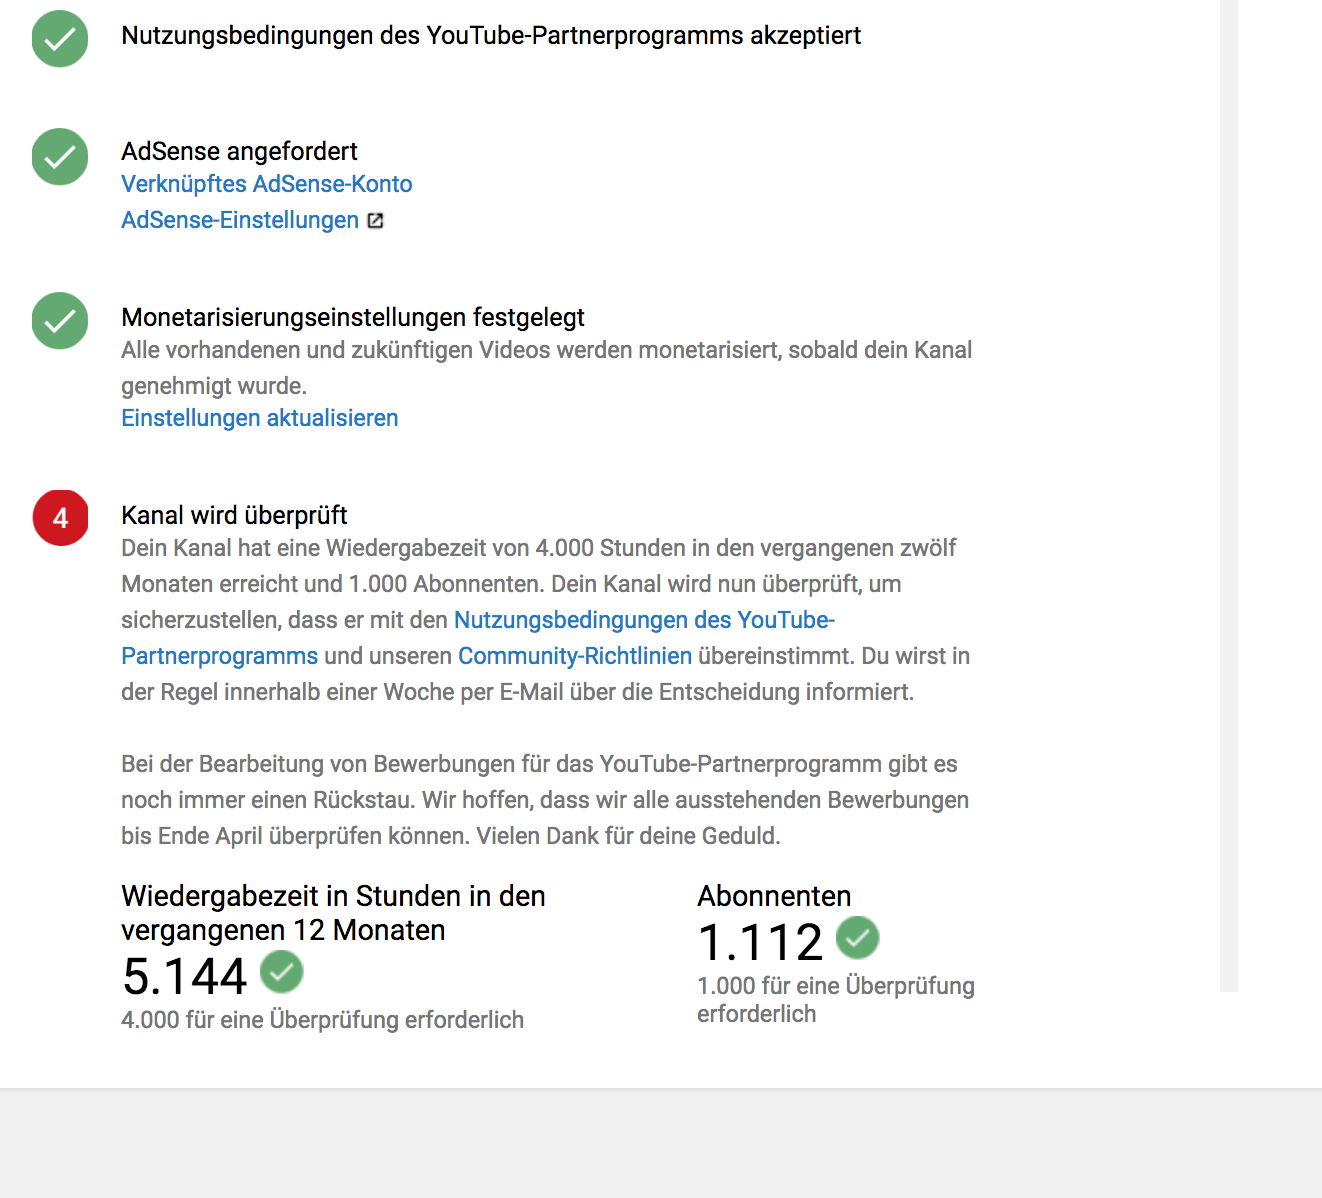 youtube monetarisierung berprfung 2018 computer - Youtube Video Bewerben